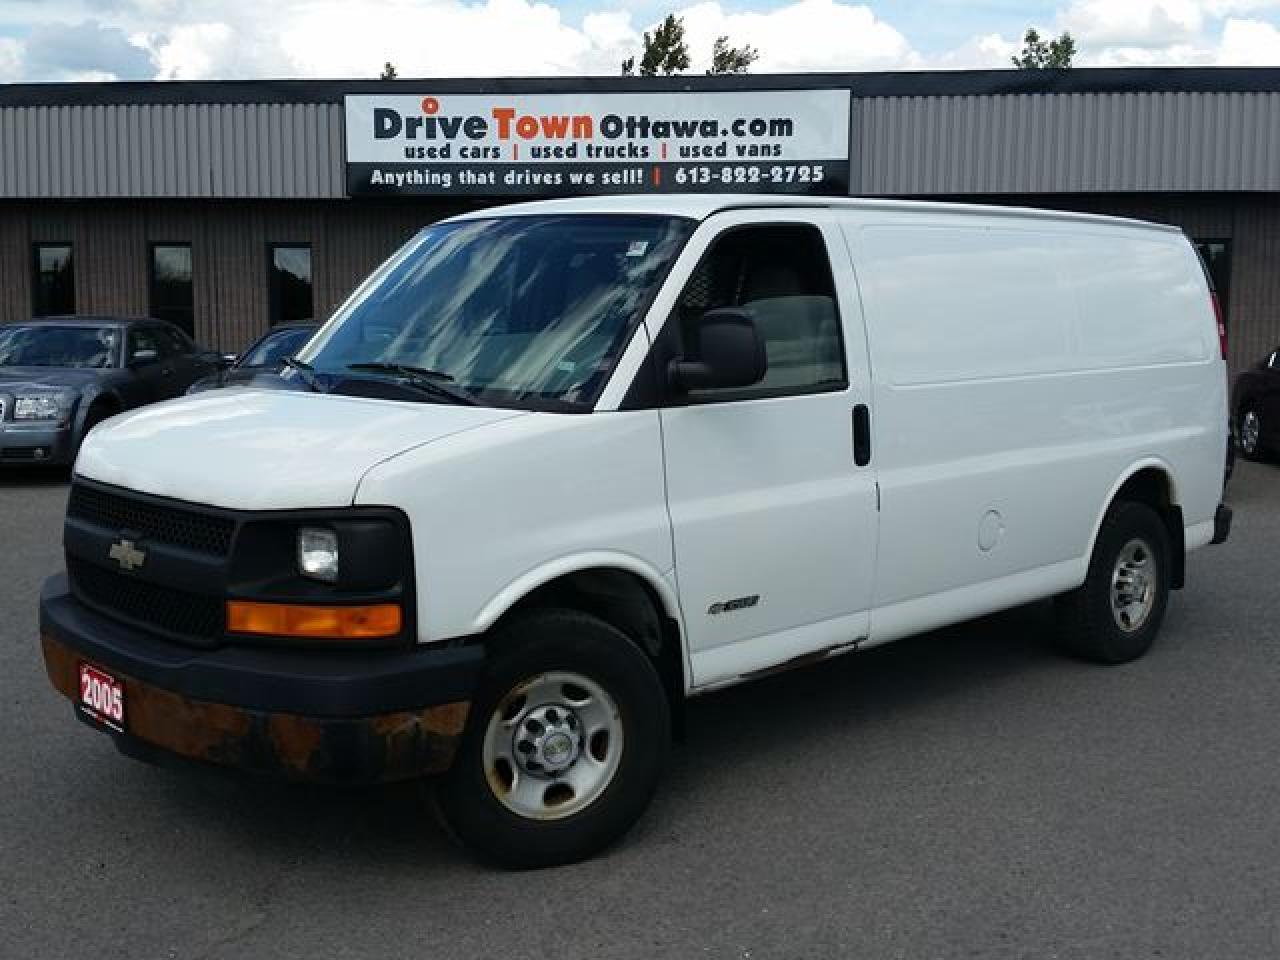 2005 Chevrolet Express 3500 1 TON Cargo Van